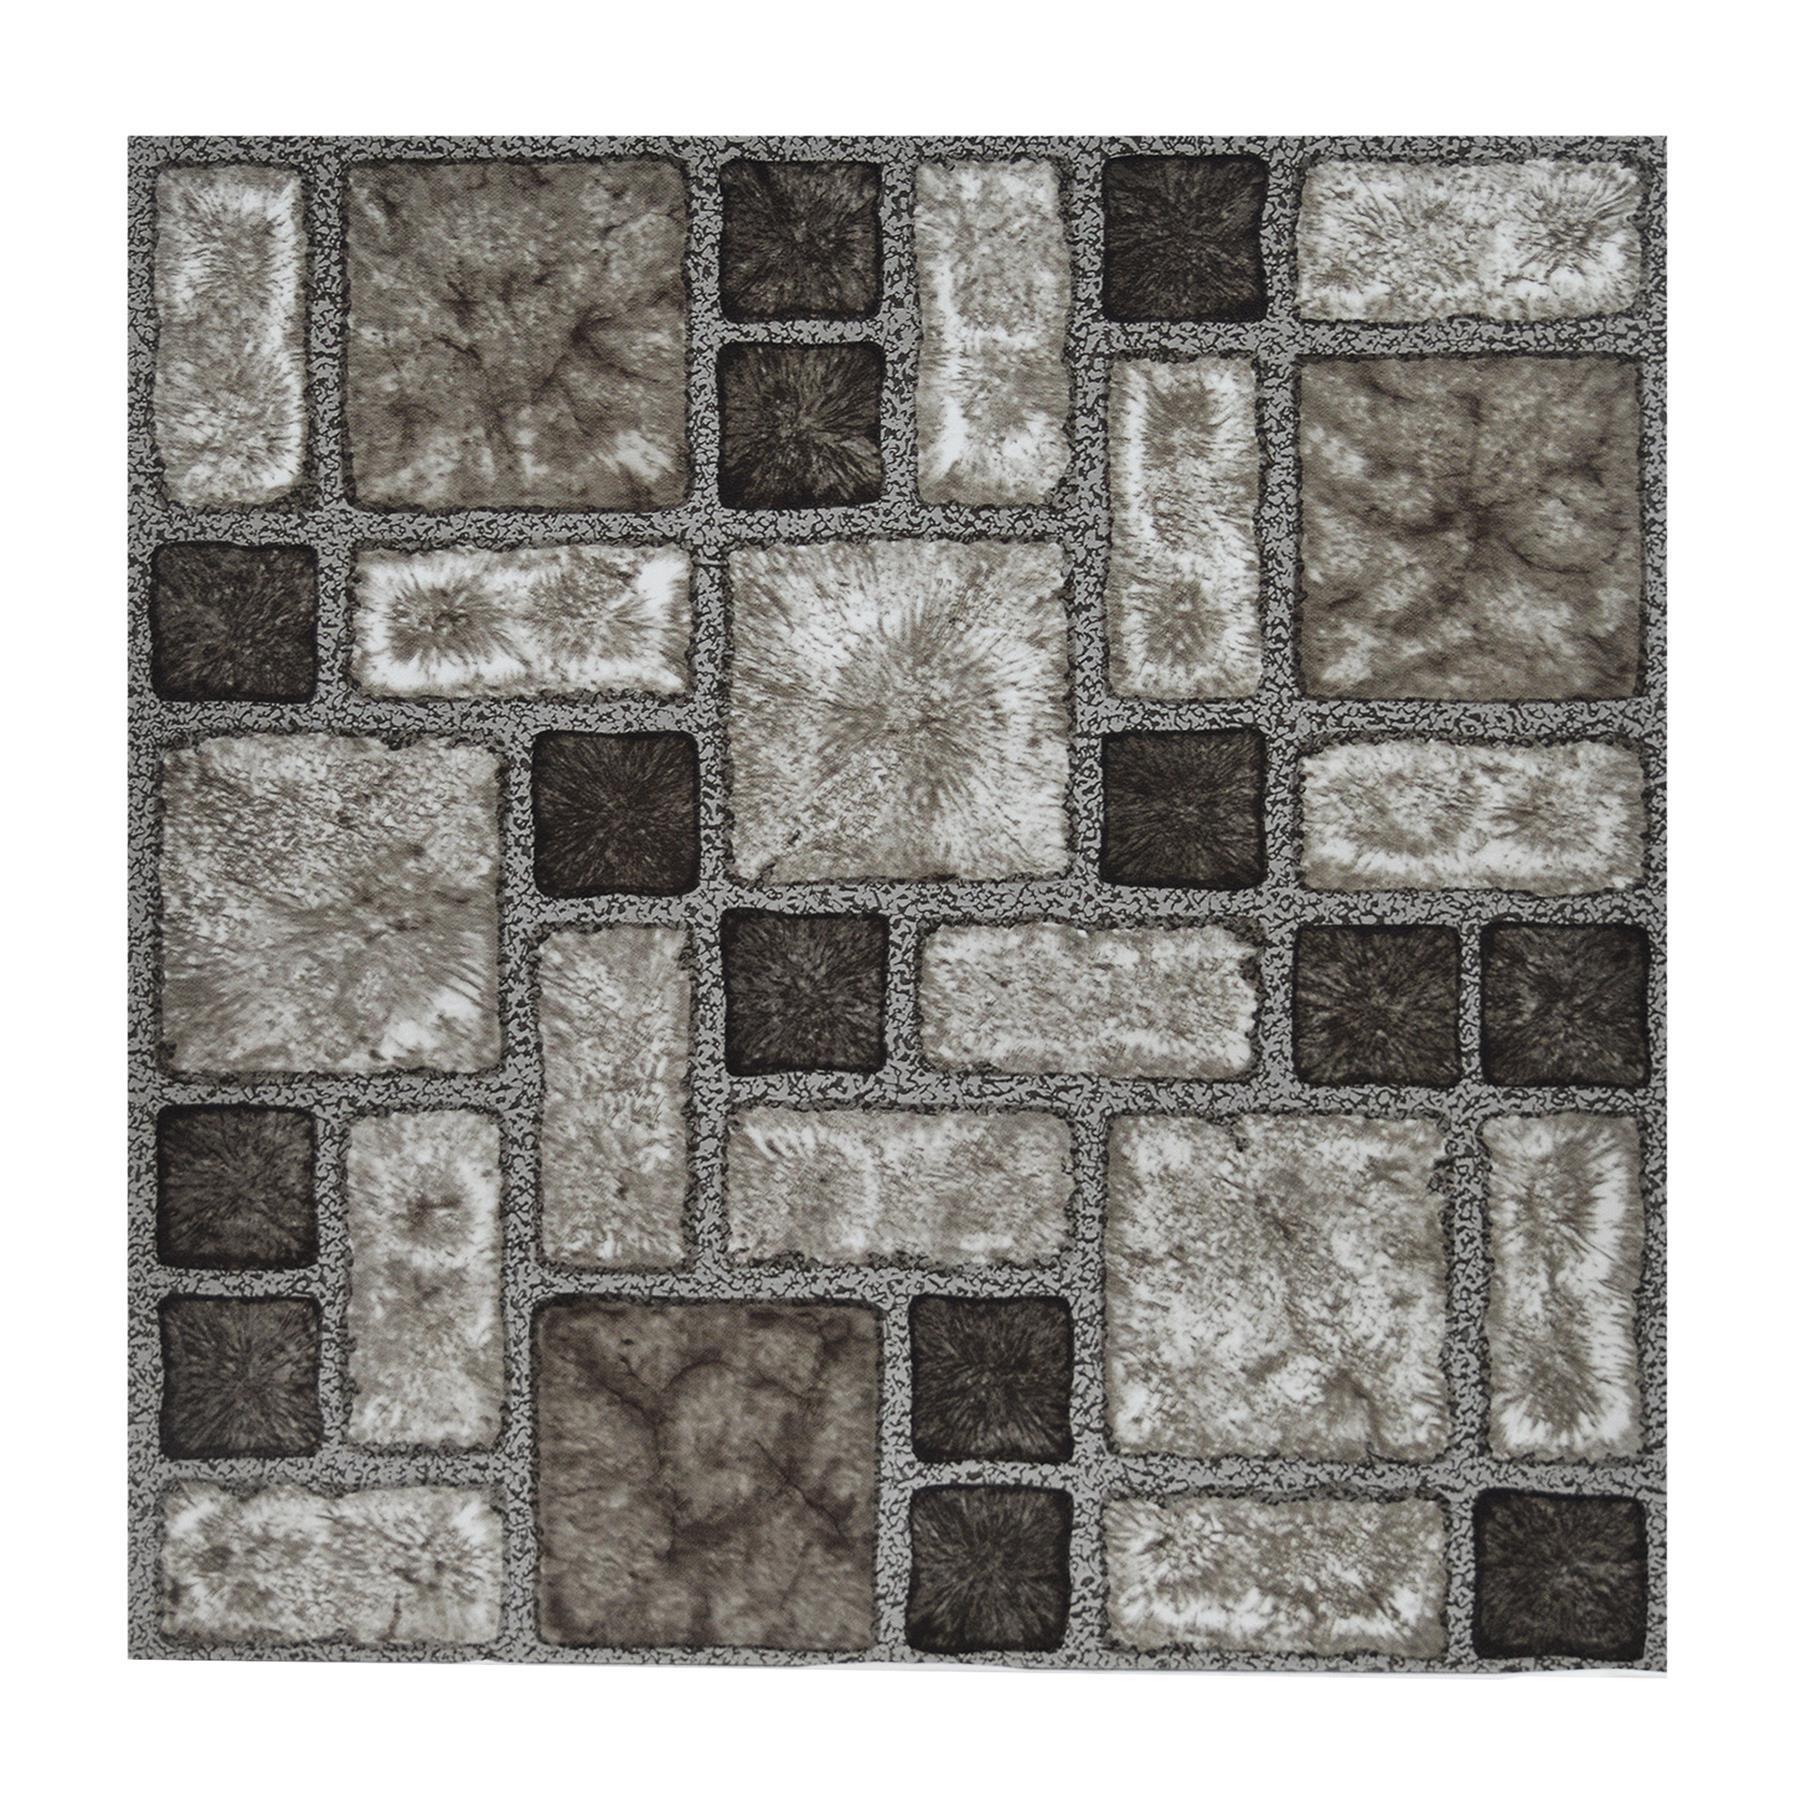 Floor Tiles Self Adhesive Vinyl Flooring Kitchen Bathroom Charcoal Stone Effect Ebay